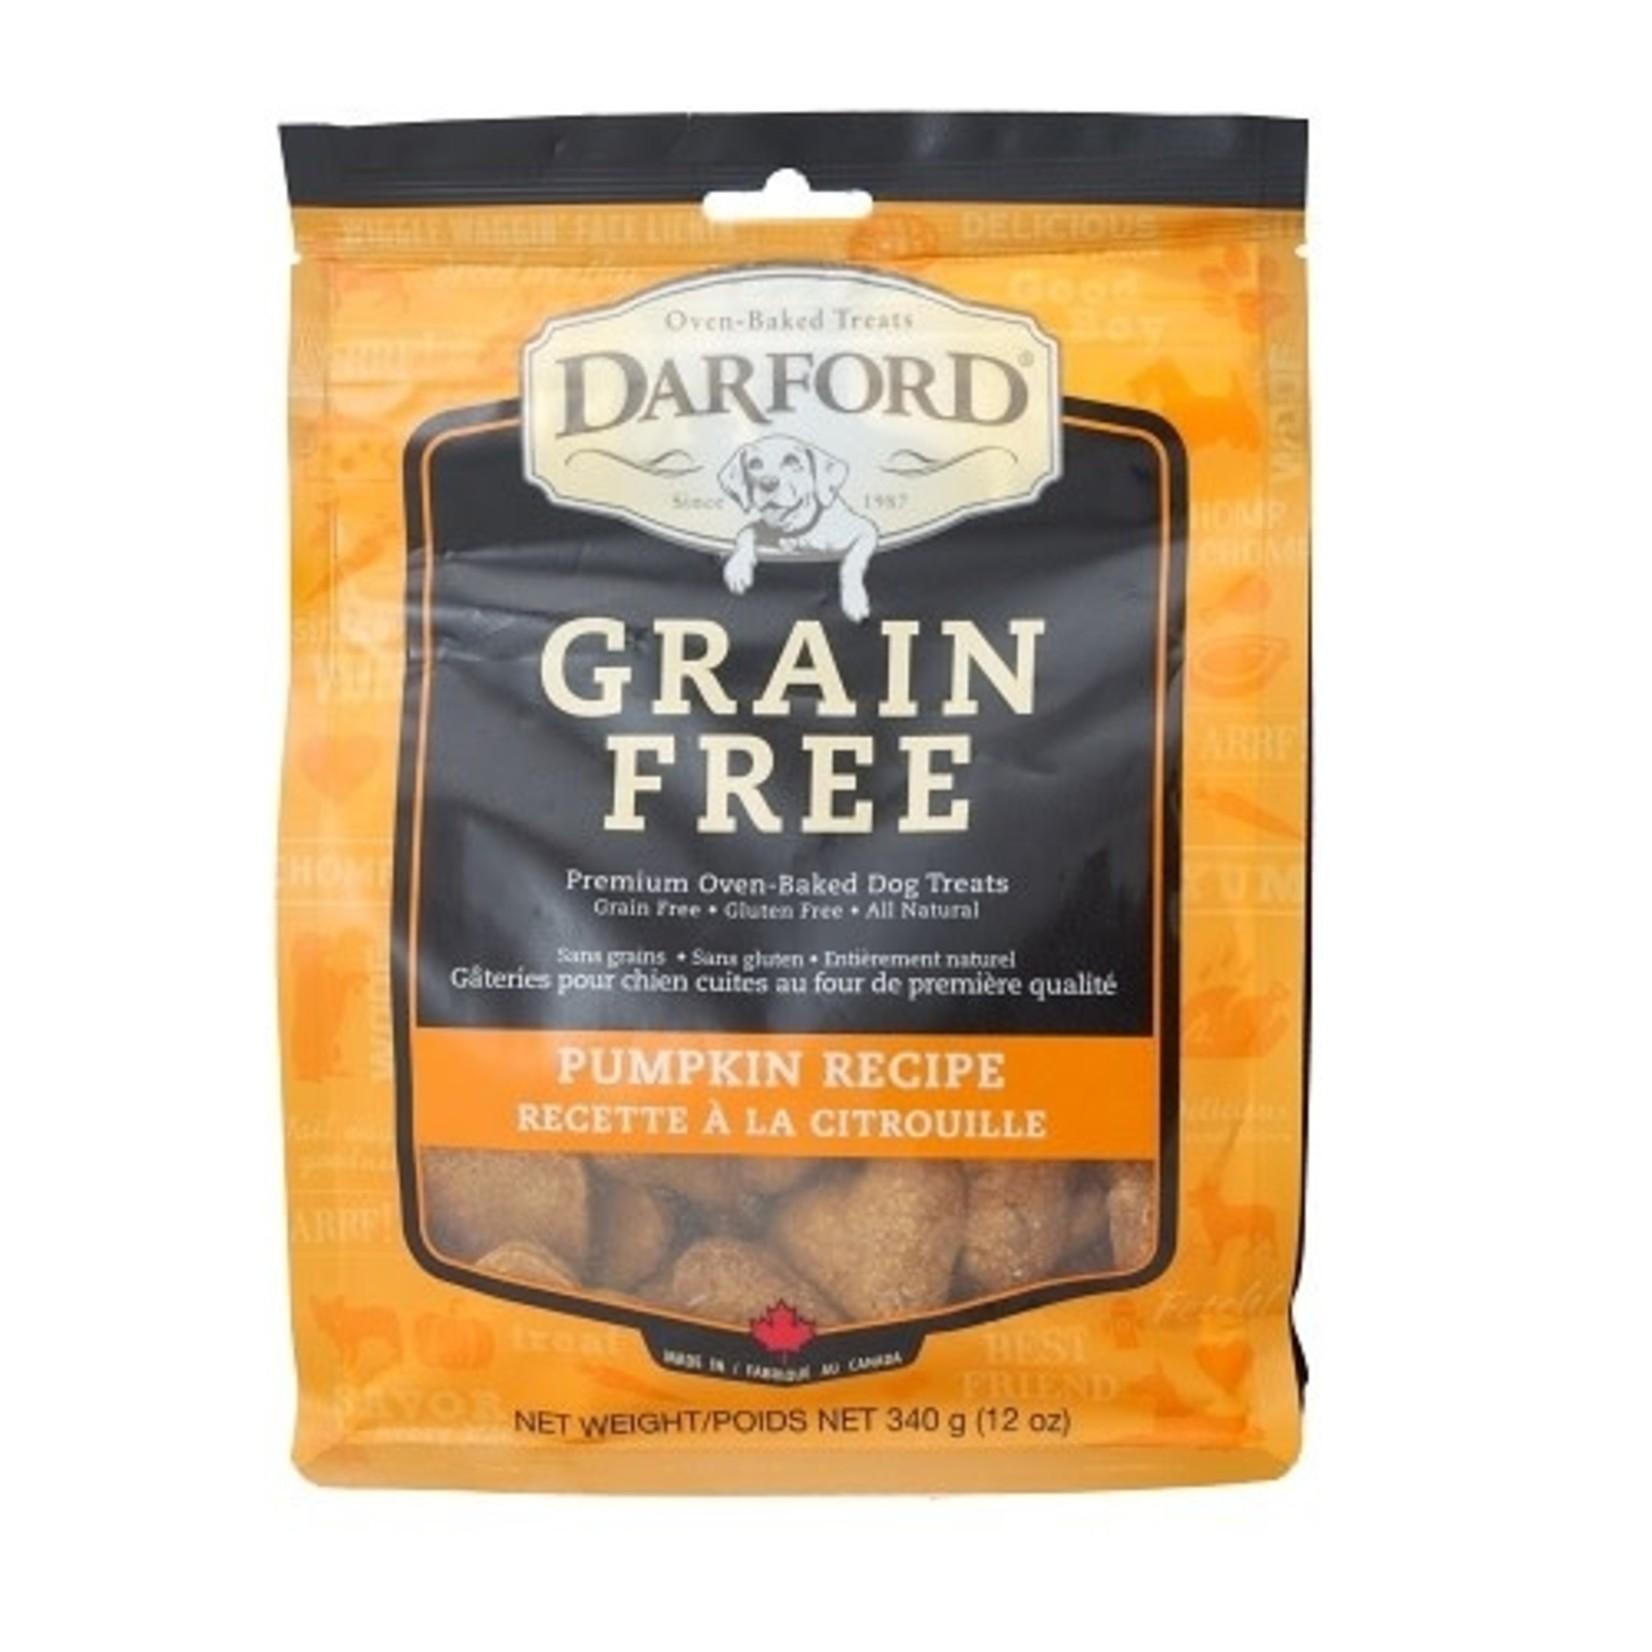 darford Darford Dog treat GF 340 g